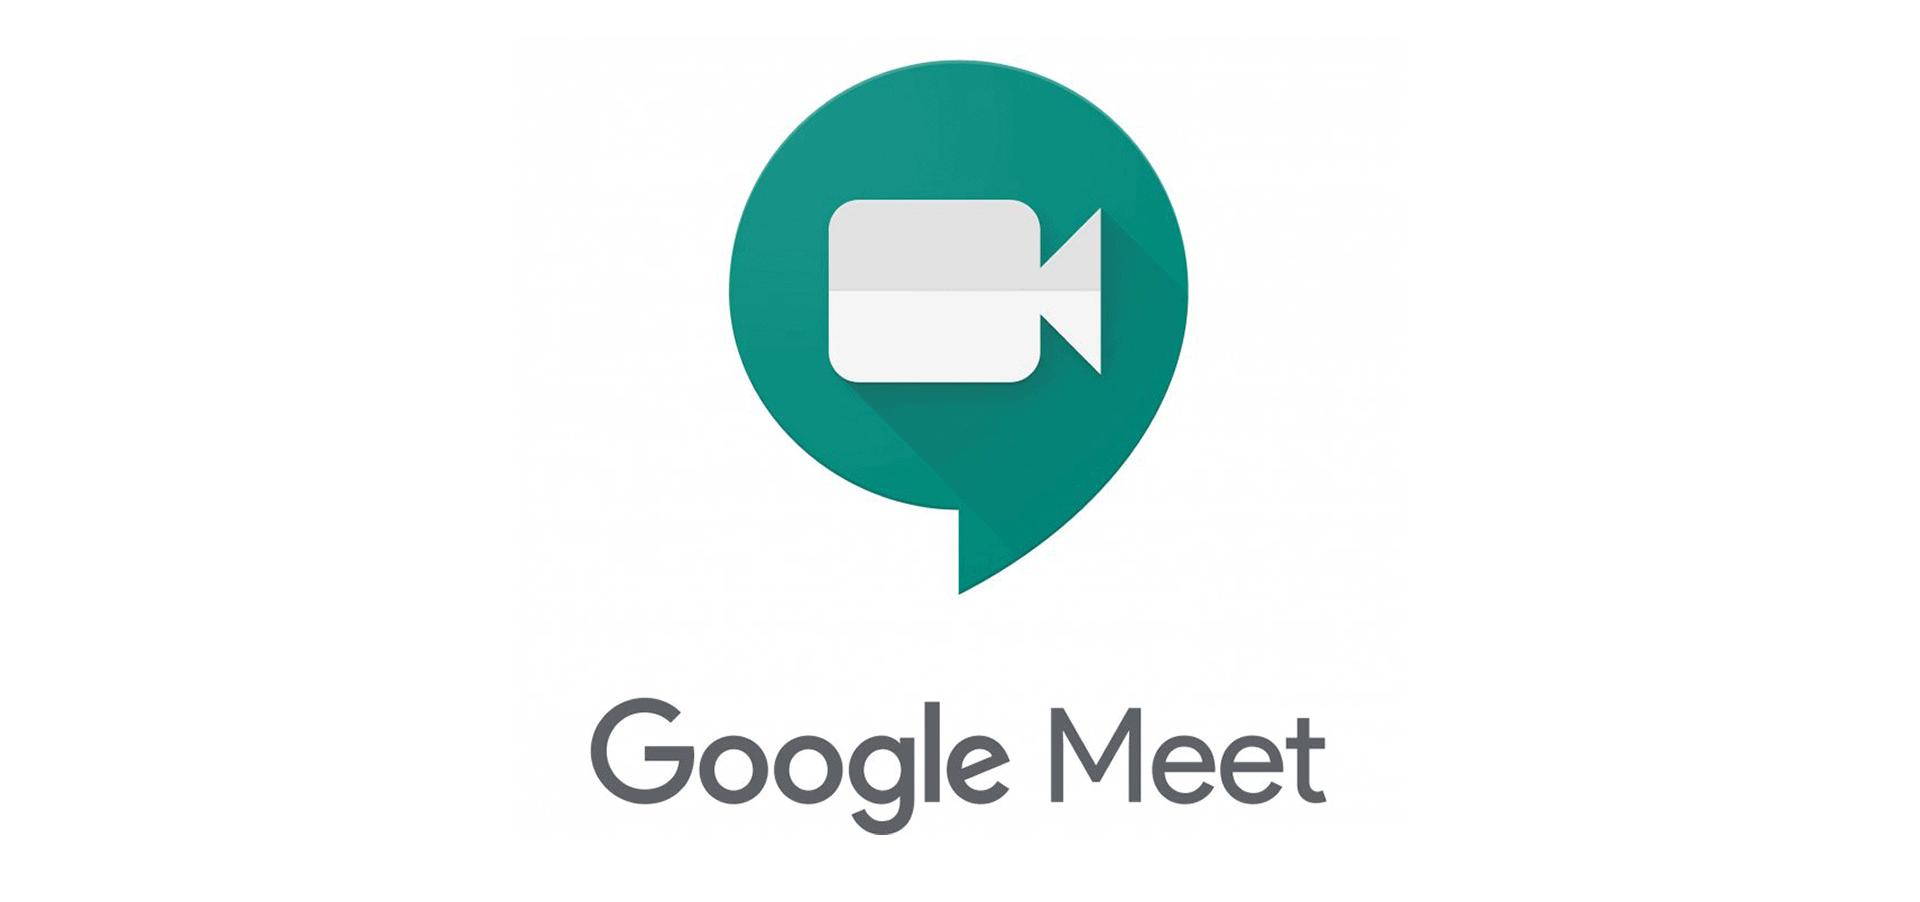 Video calling app 8- Google meet